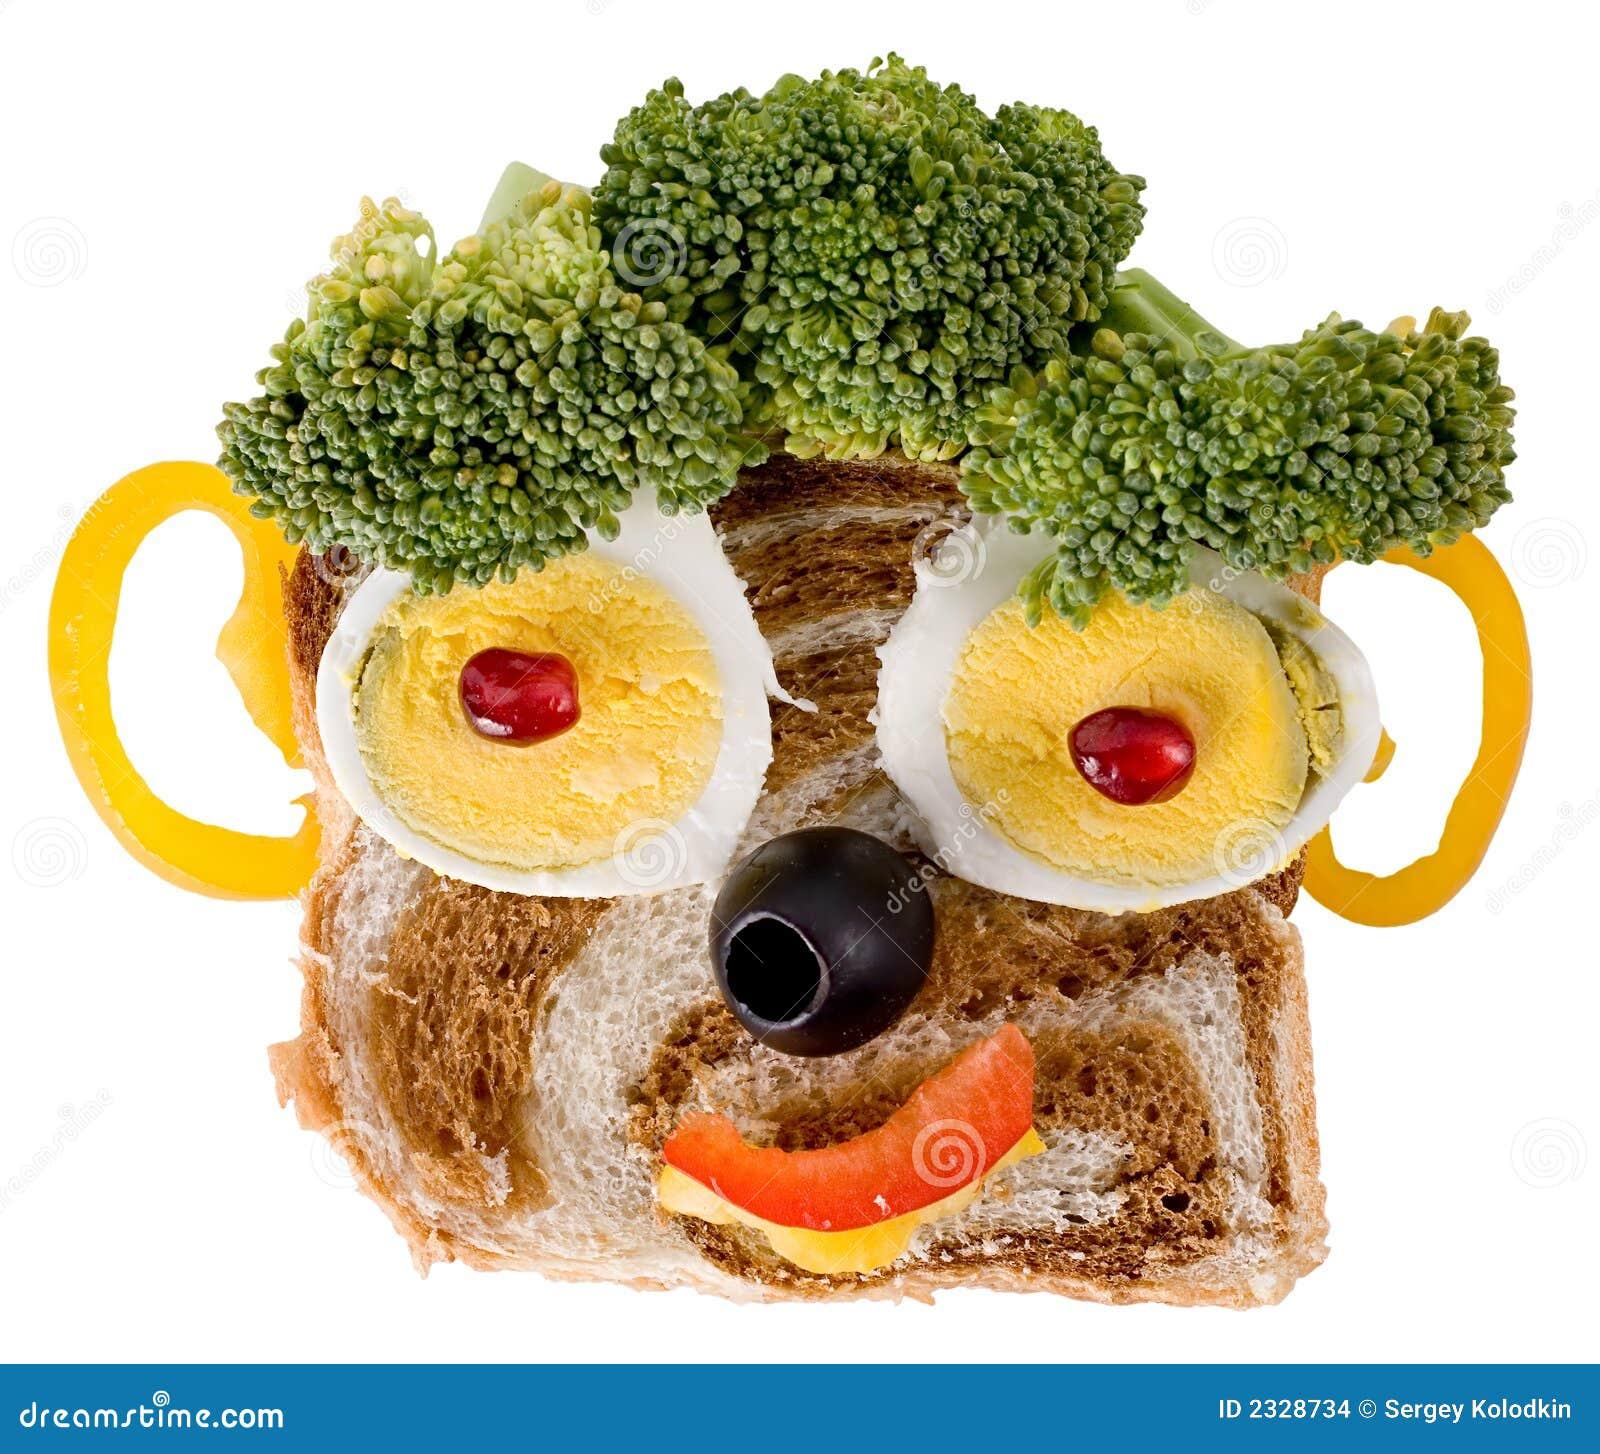 smiling food face stock photo image of glad head satisfied 2328734. Black Bedroom Furniture Sets. Home Design Ideas